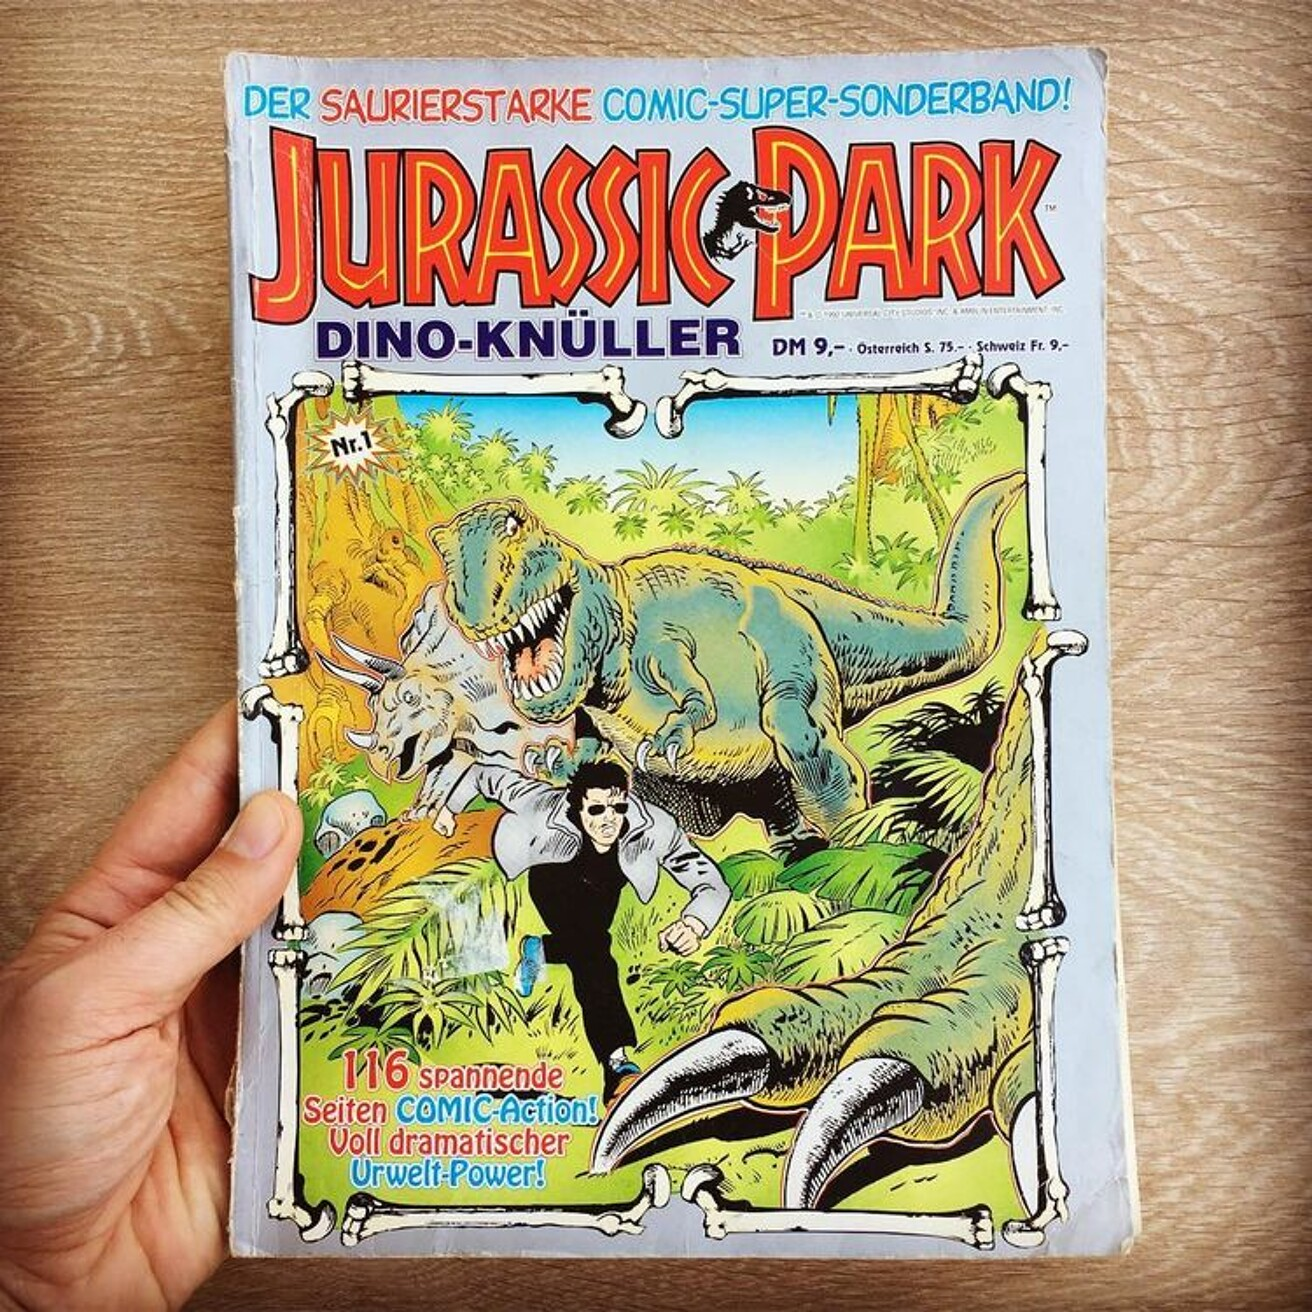 Jurassic Park Dino Knuller Comic Book German Item Golisto